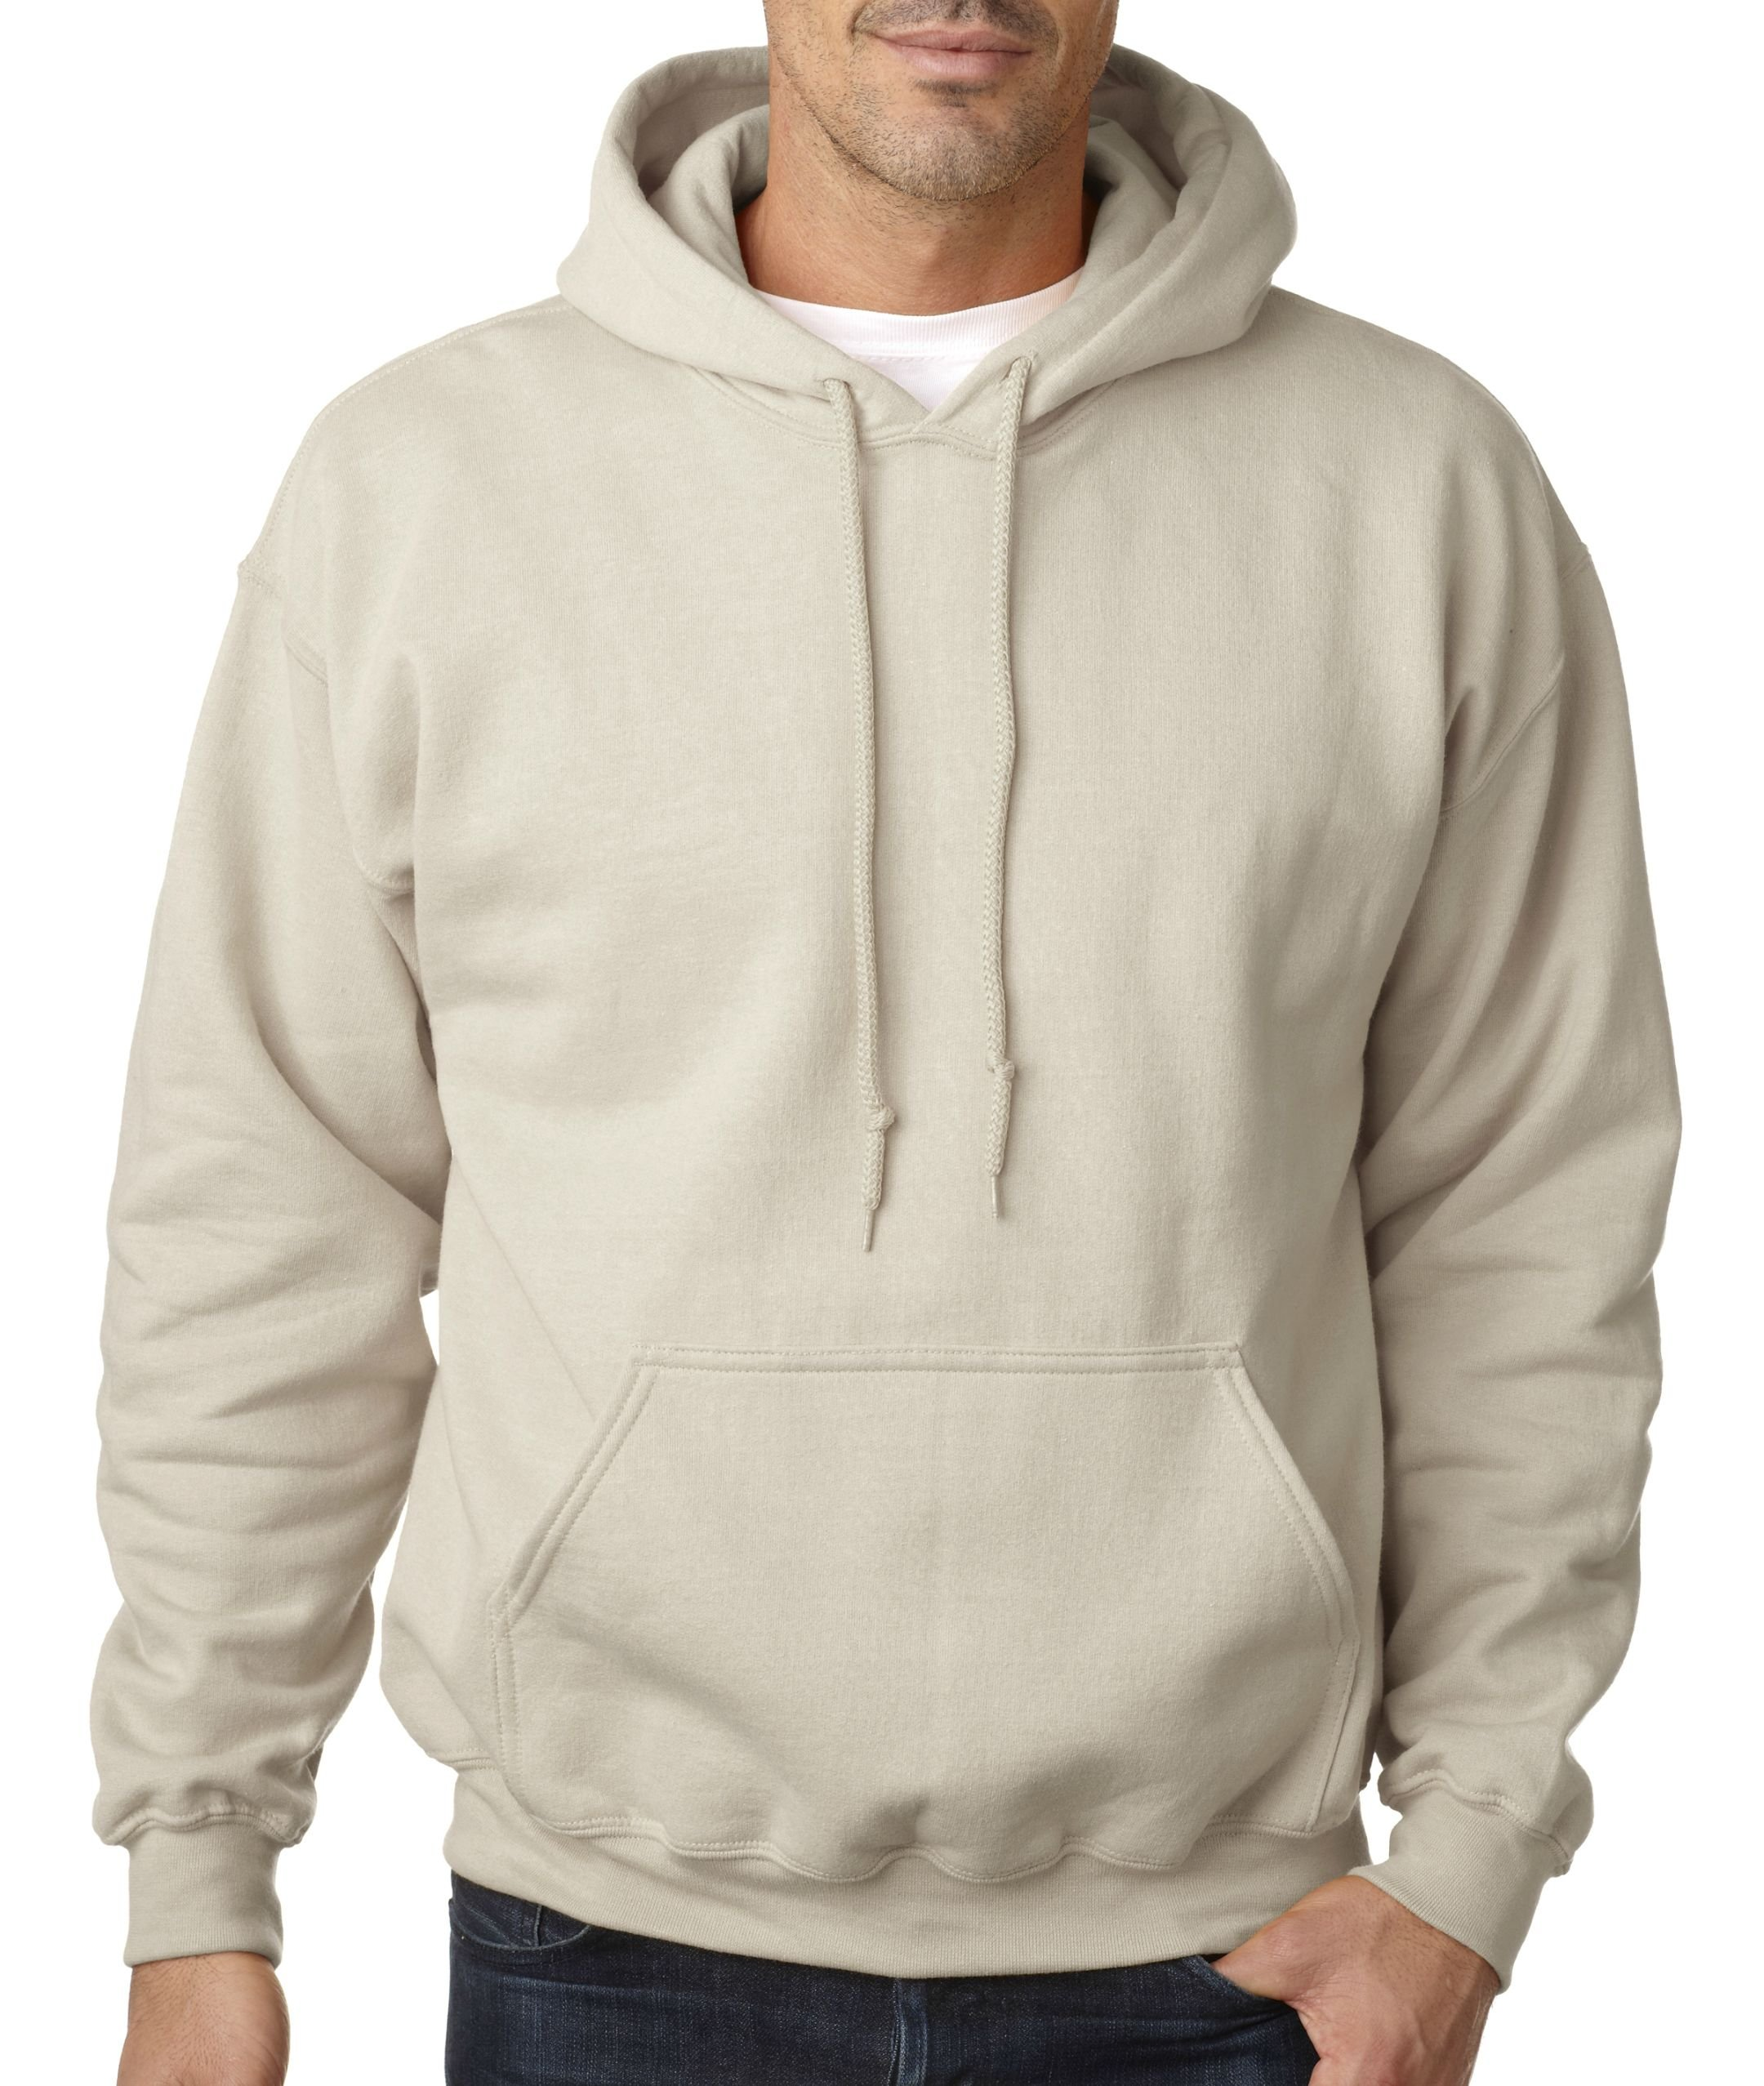 Gildan Adult Heavy Blend� Hooded Sweatshirt (Sand) (Medium) by Gildan